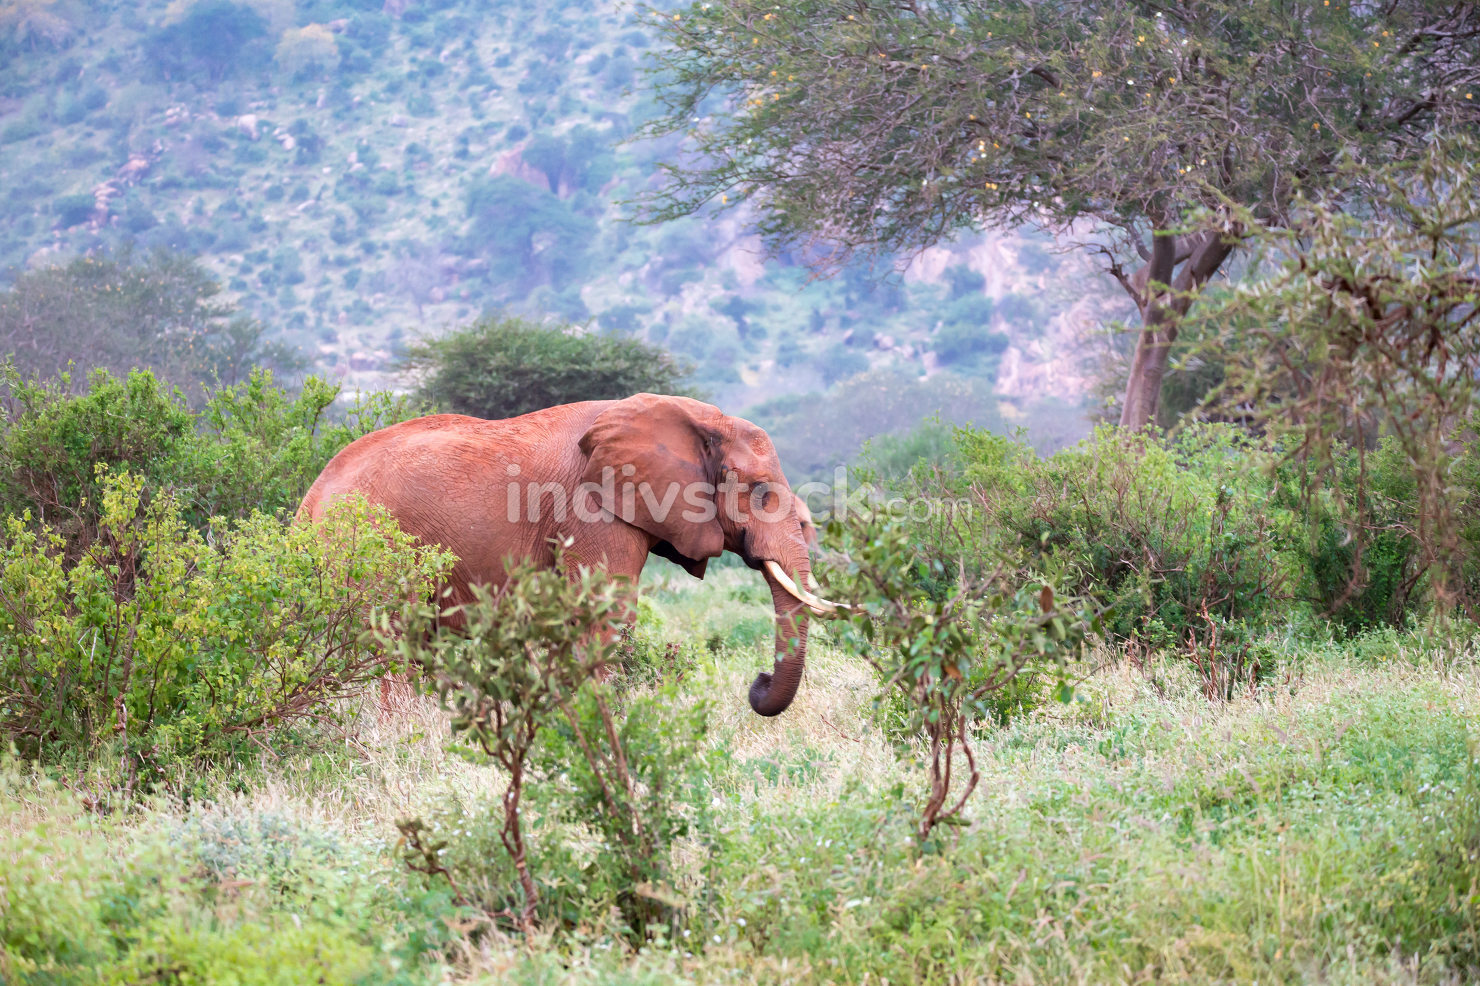 A big red elephant standing between the bush, Kenya Africa